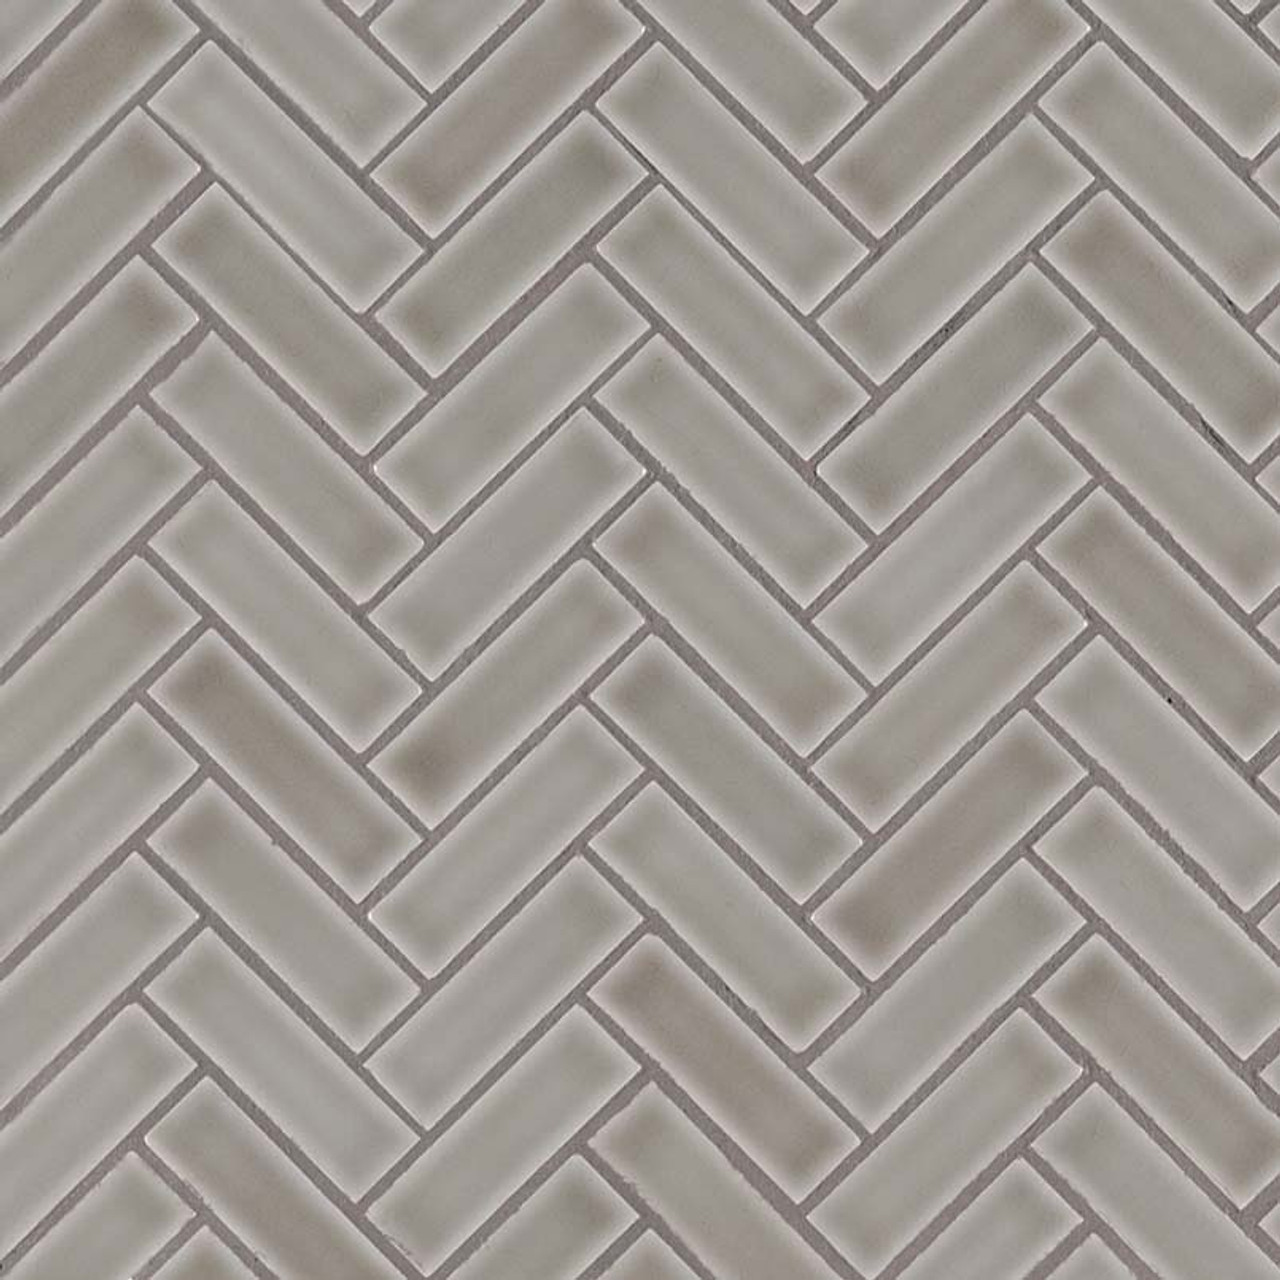 - Highland Park Dove Gray Herringbone Mosaic - Tiles Direct Store